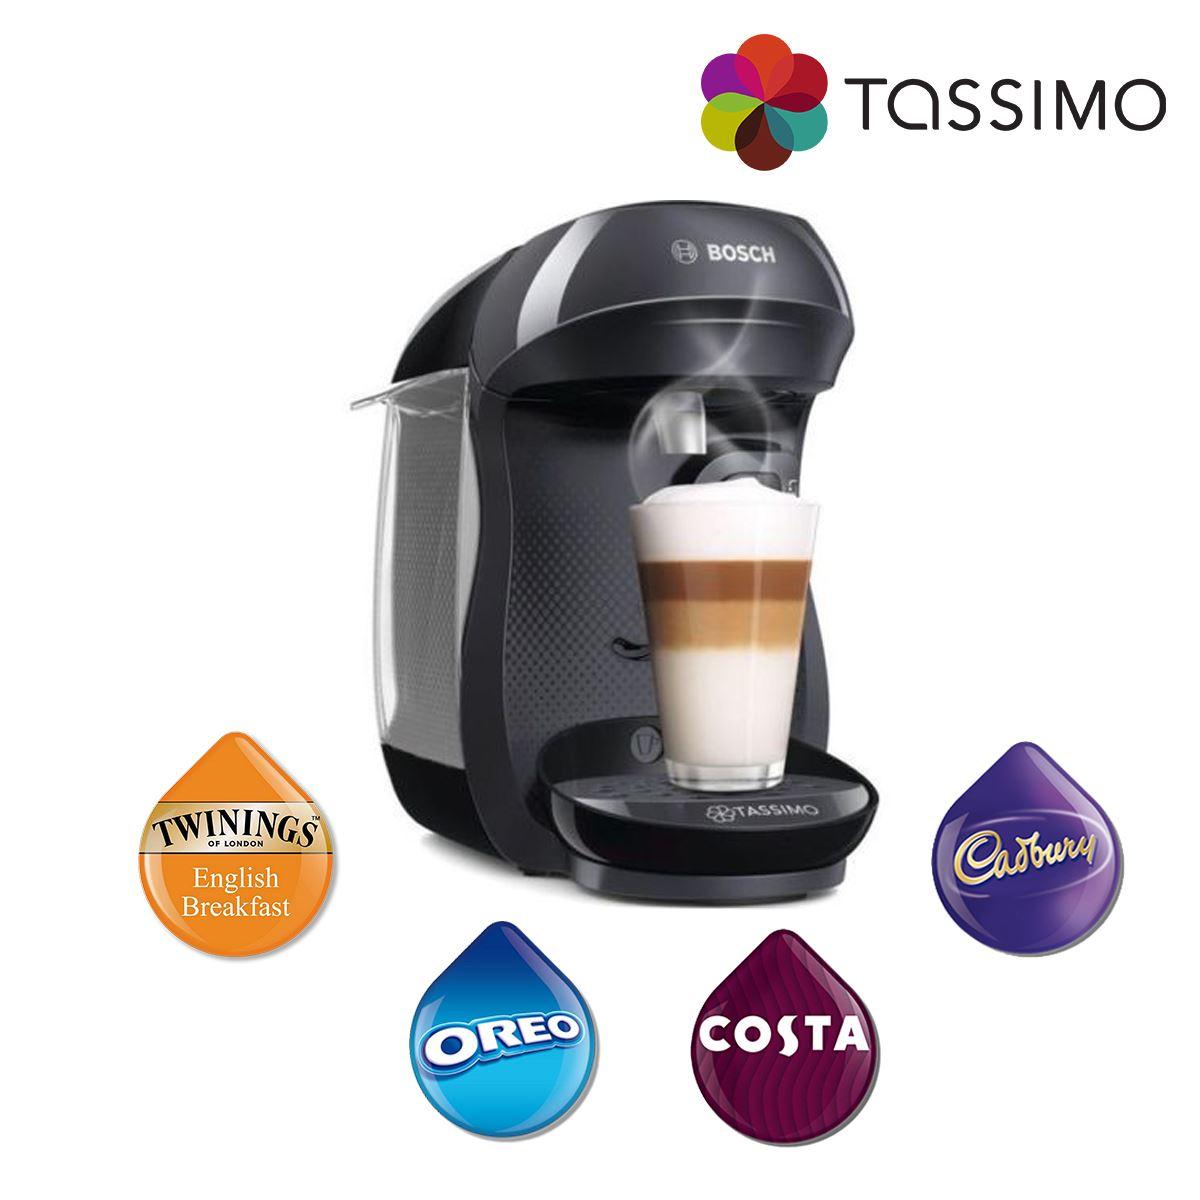 Details About Tassimo Tas1002gb Happy Costa Coffee Hot Drinks Coffee Machine 1400w 07l Bosch